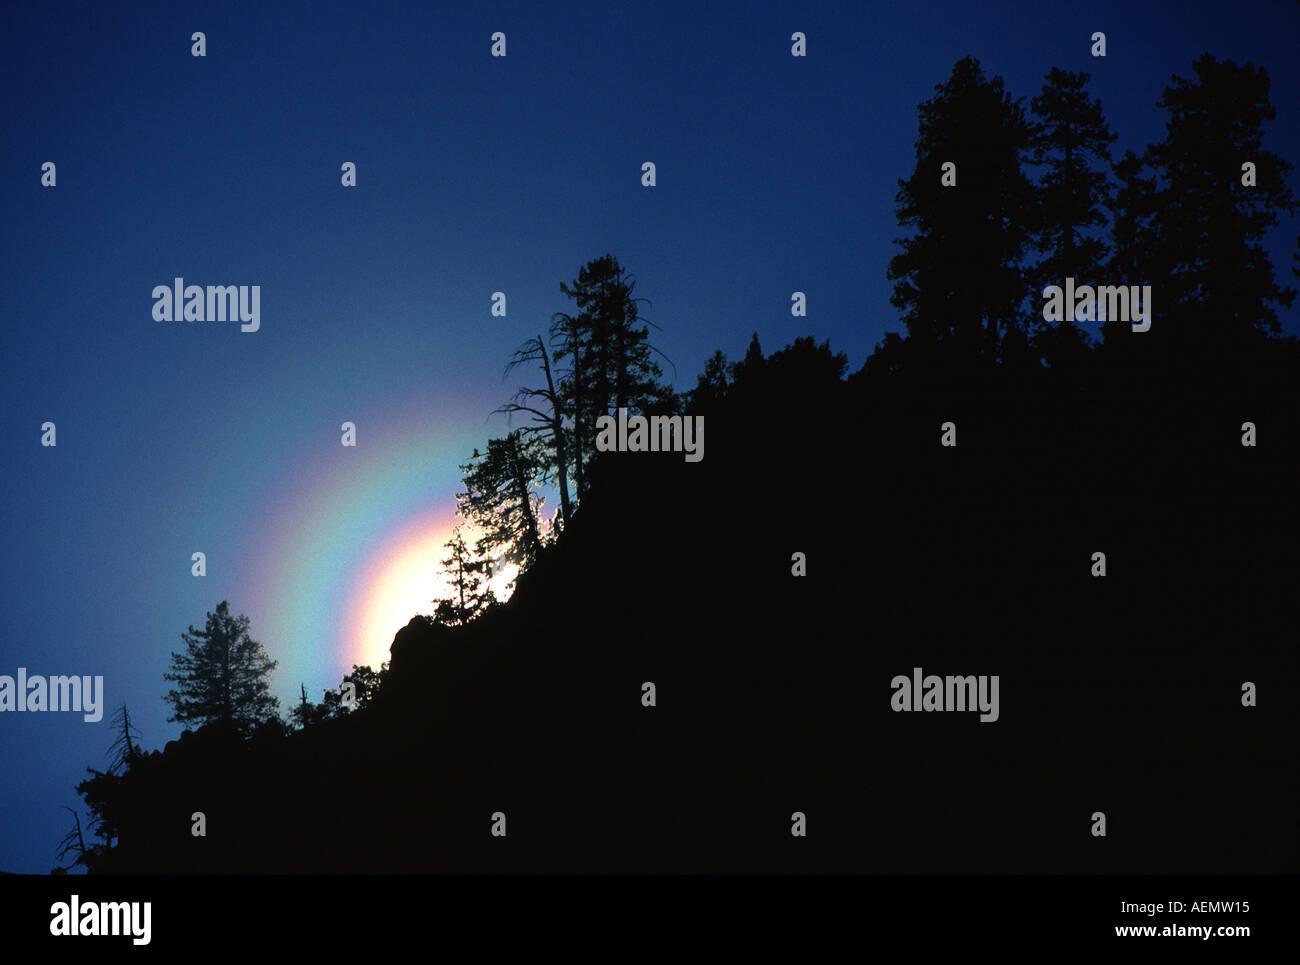 sunbow yosemite national park california - Stock Image